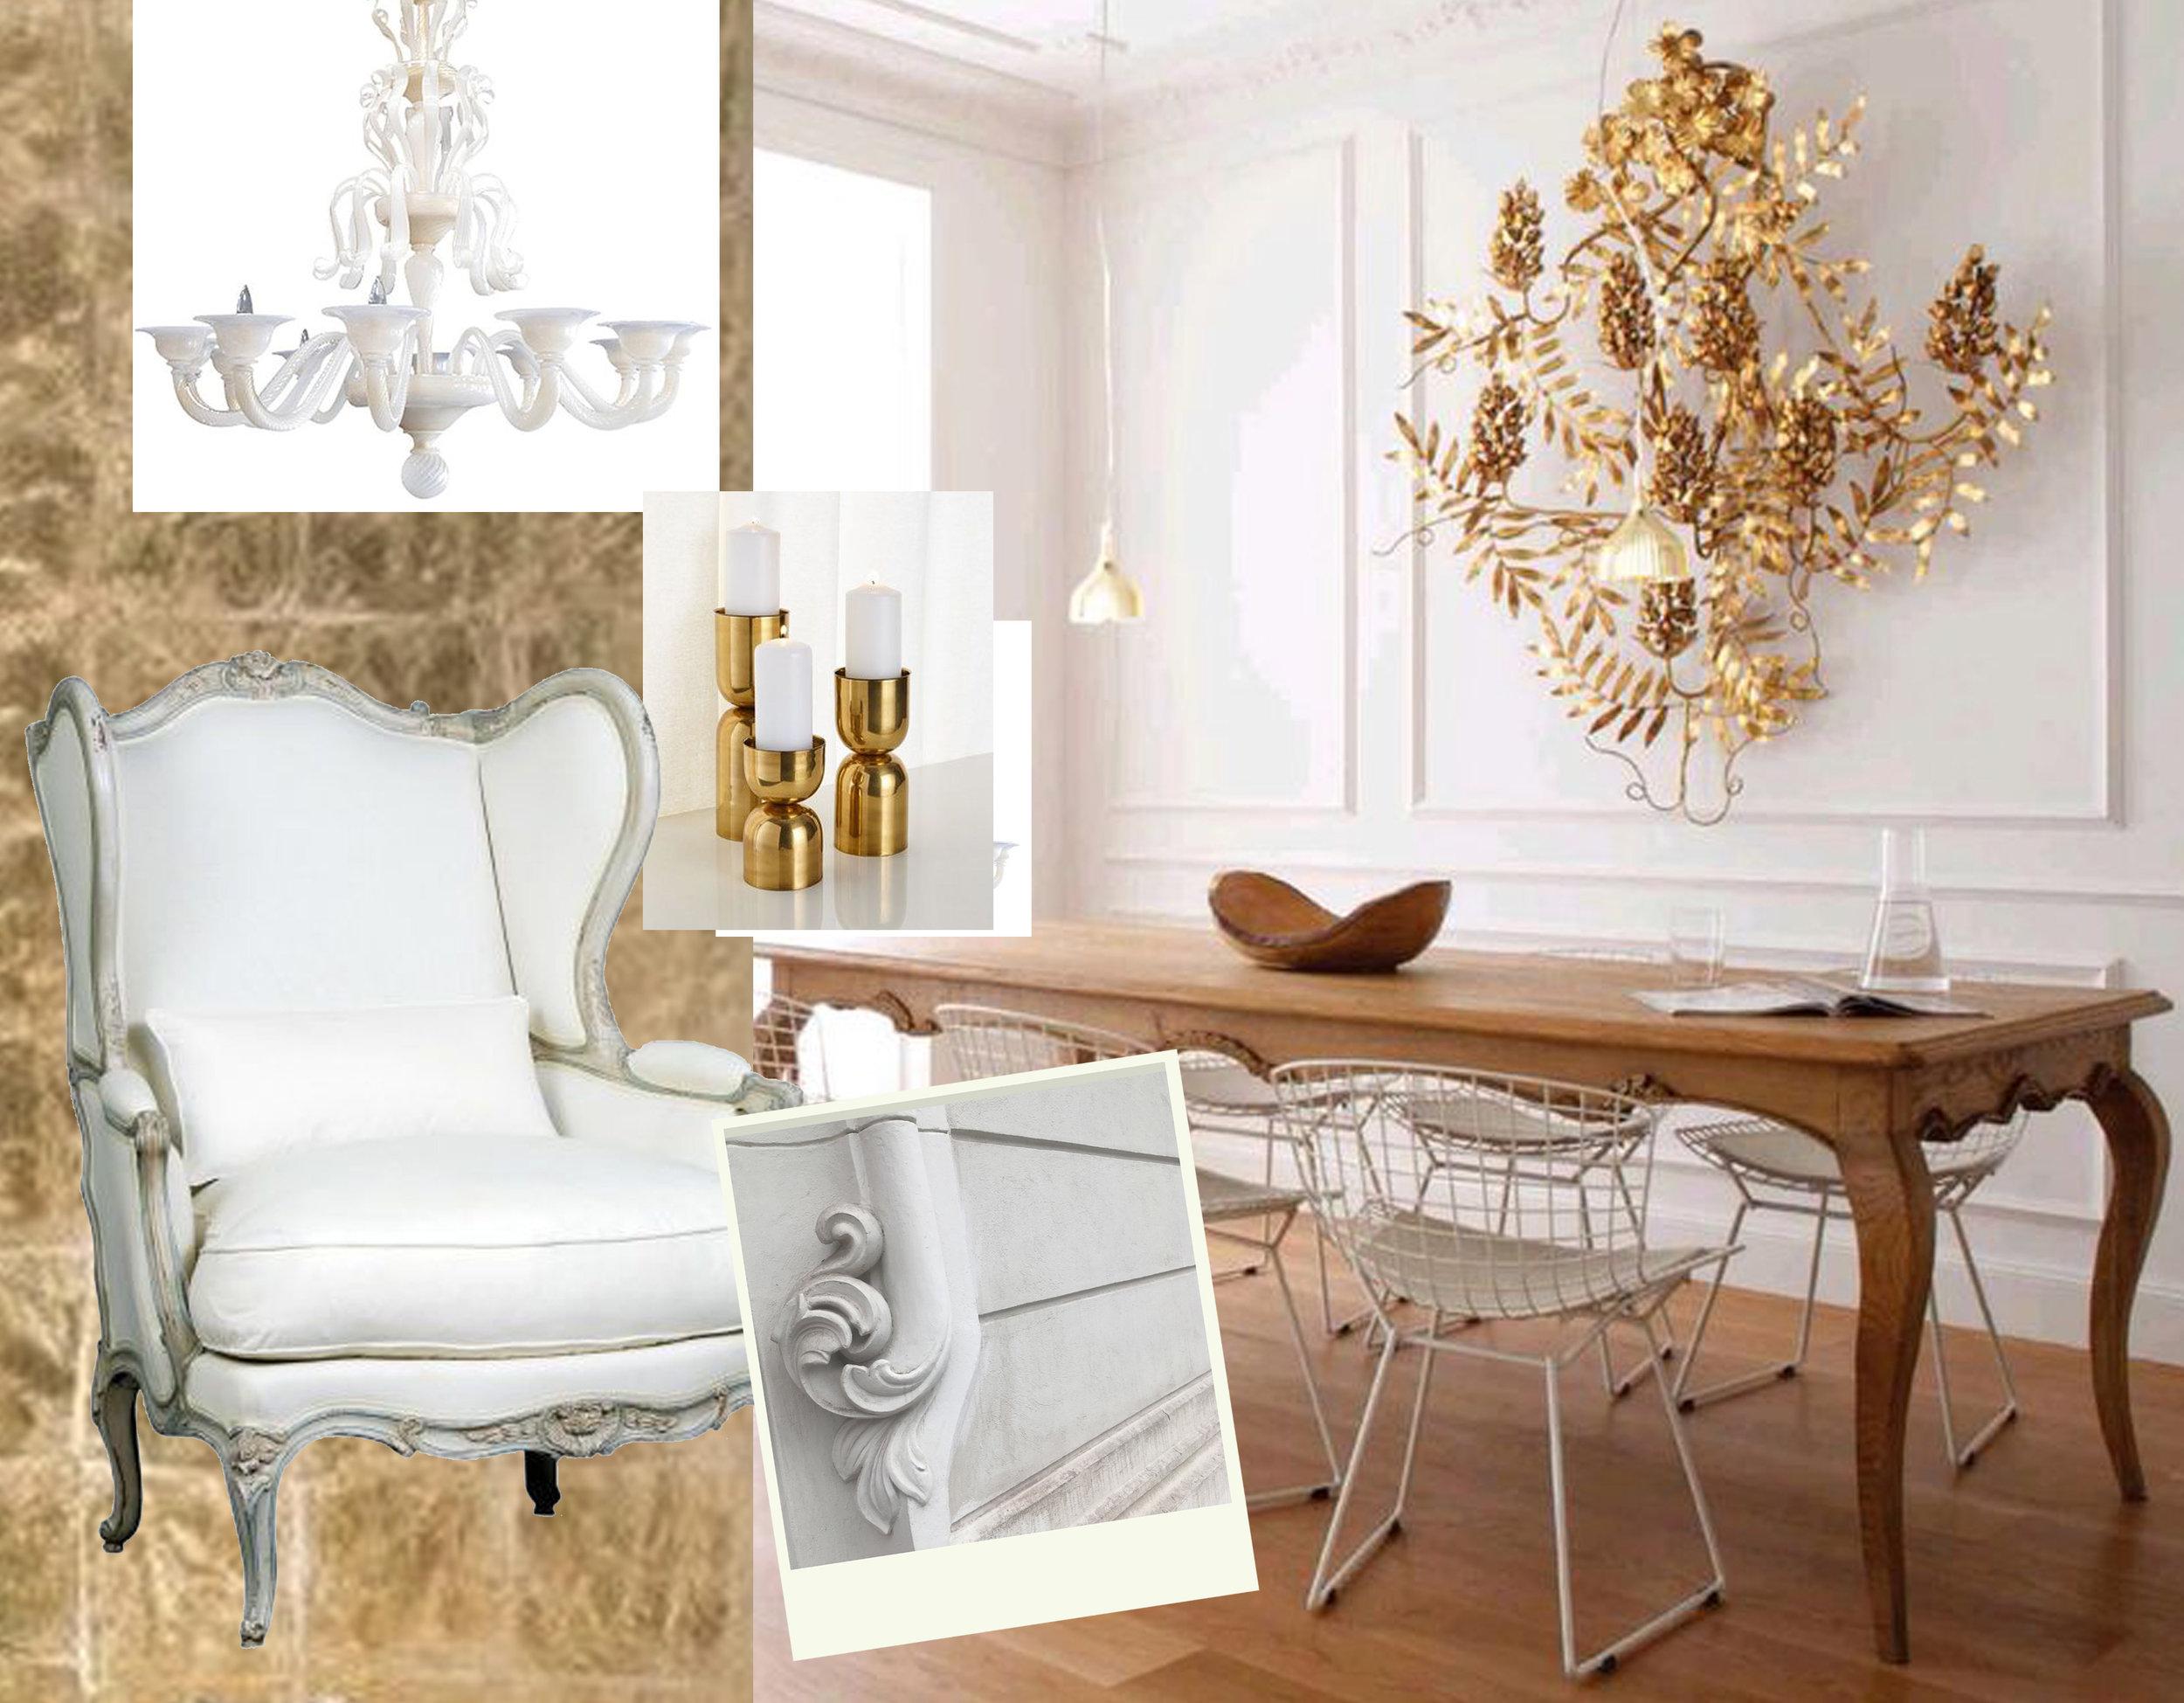 Murano Chandelier  1stdibs  - candle sticks  Horchow  - Louis XV wingchair  Massant  - interior design  Mikel Irastorza